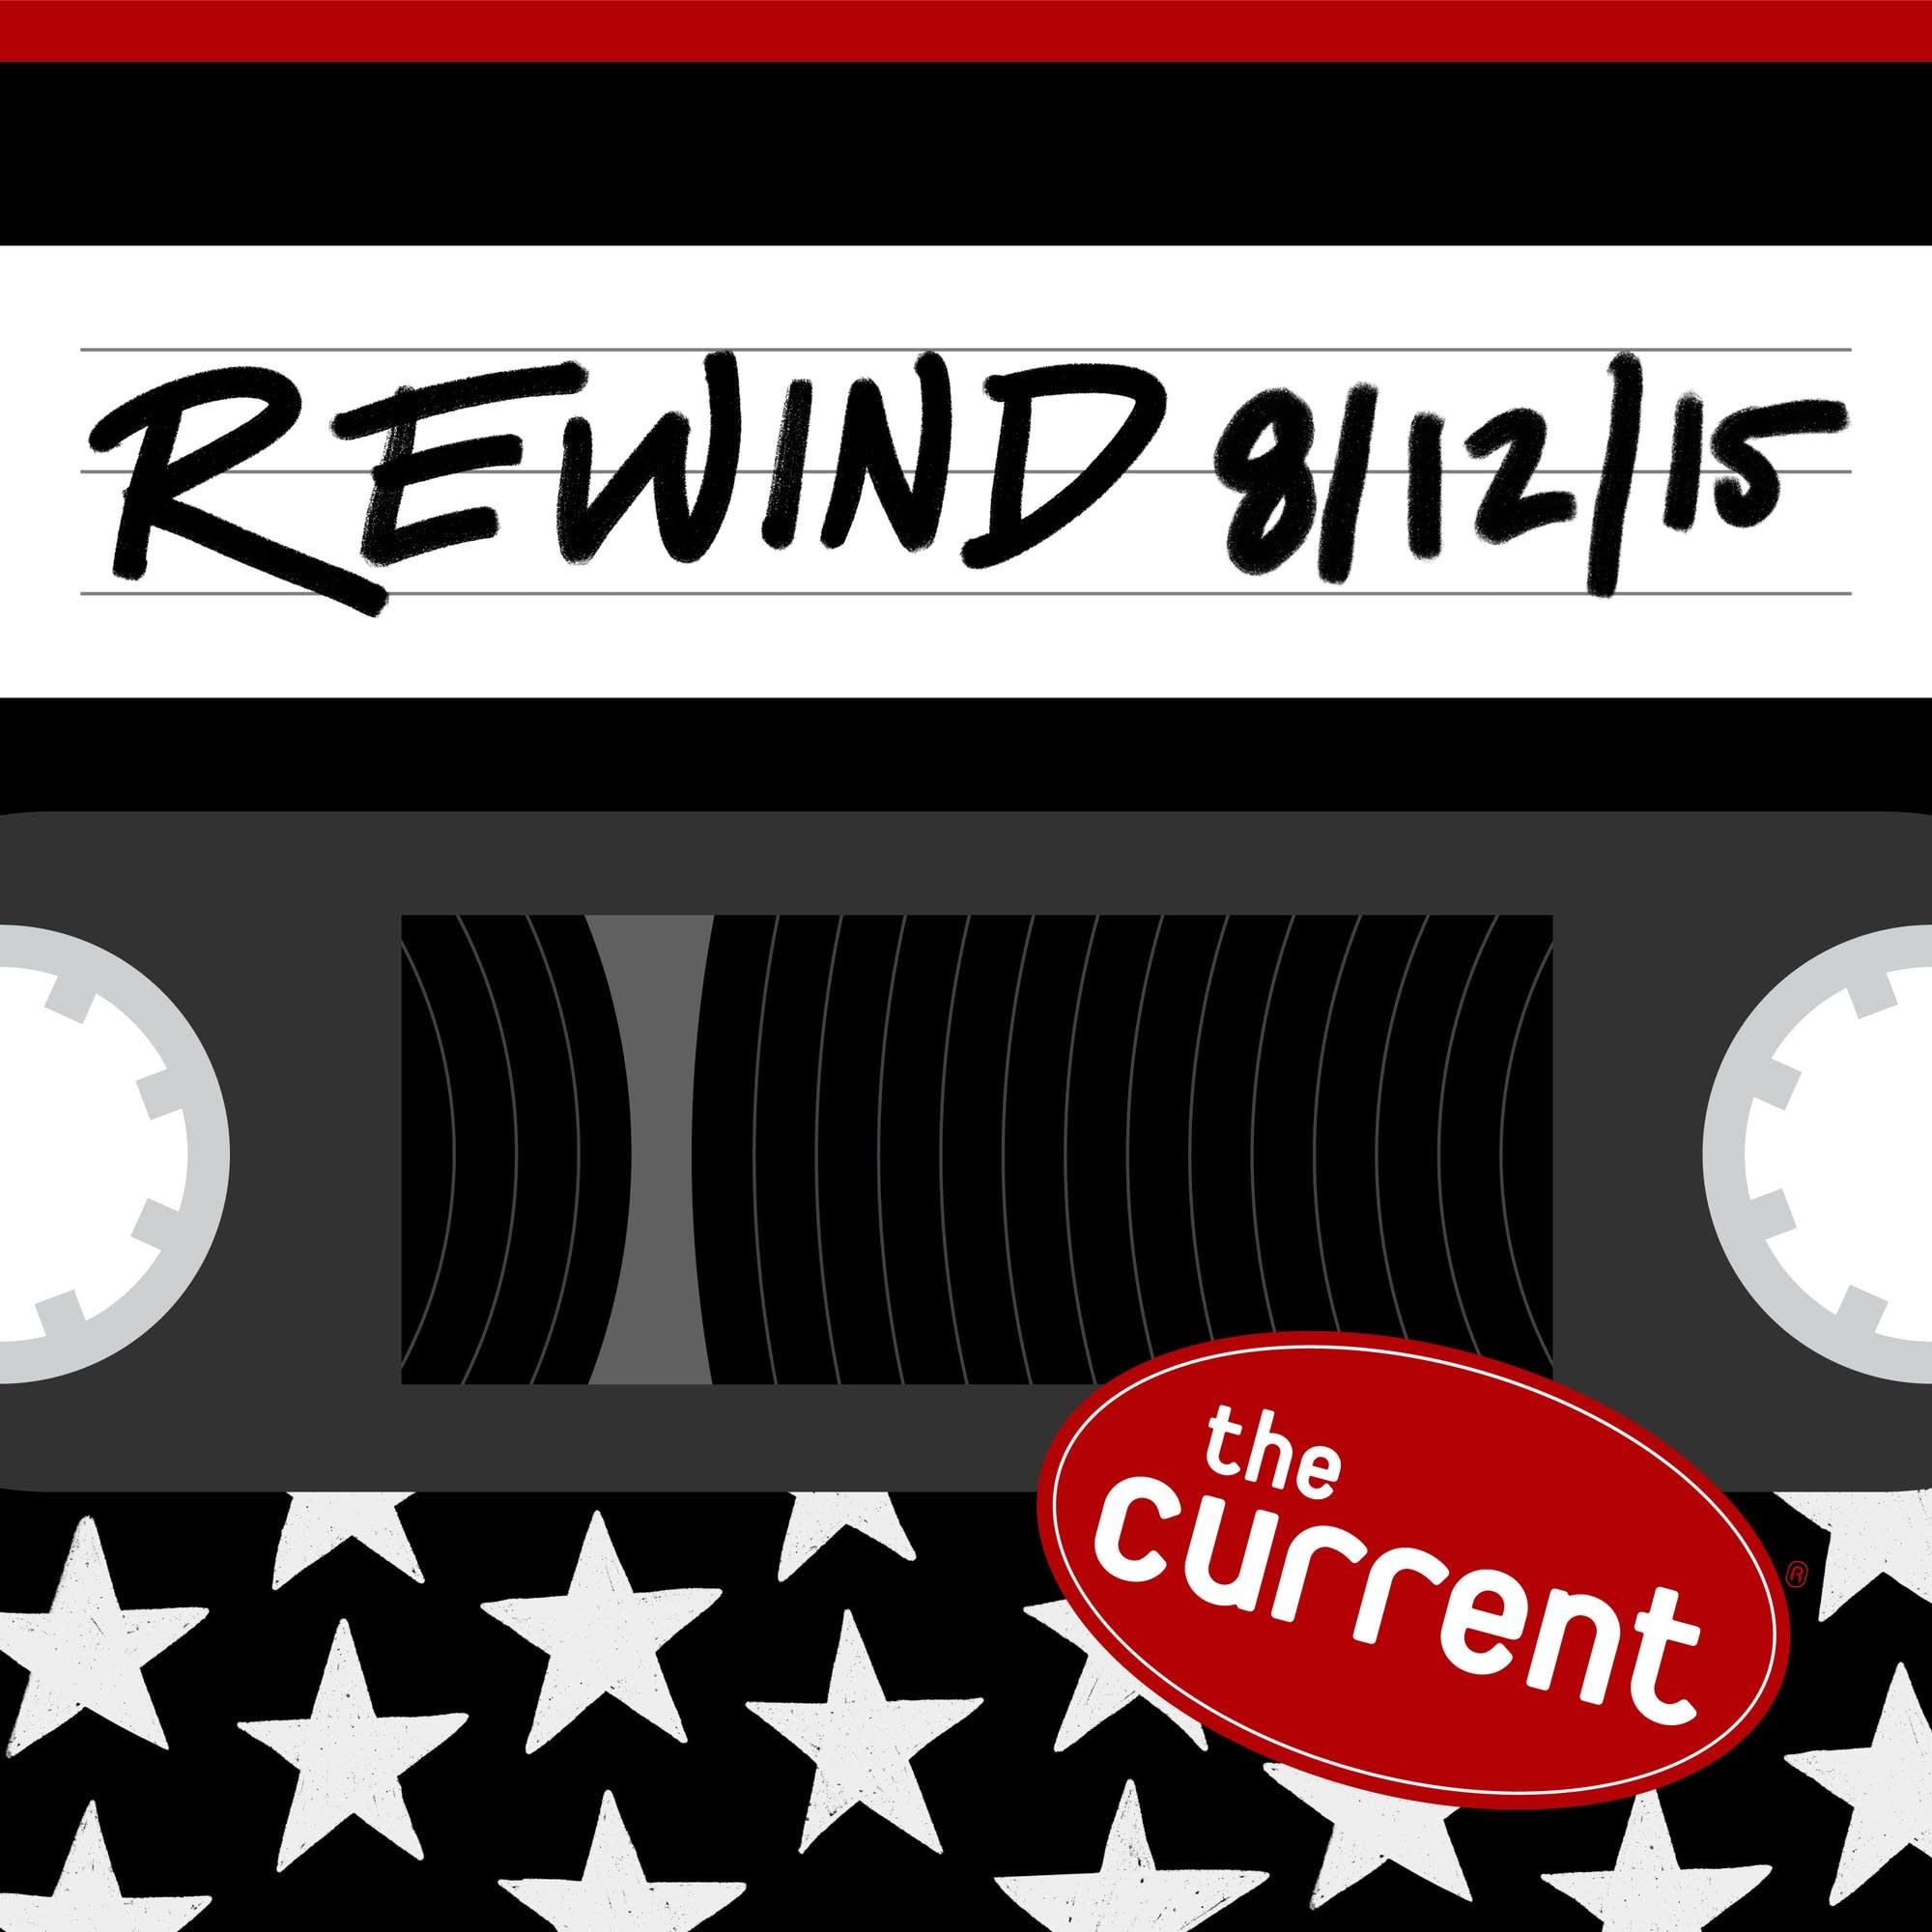 The Current Rewind: 8/12/15